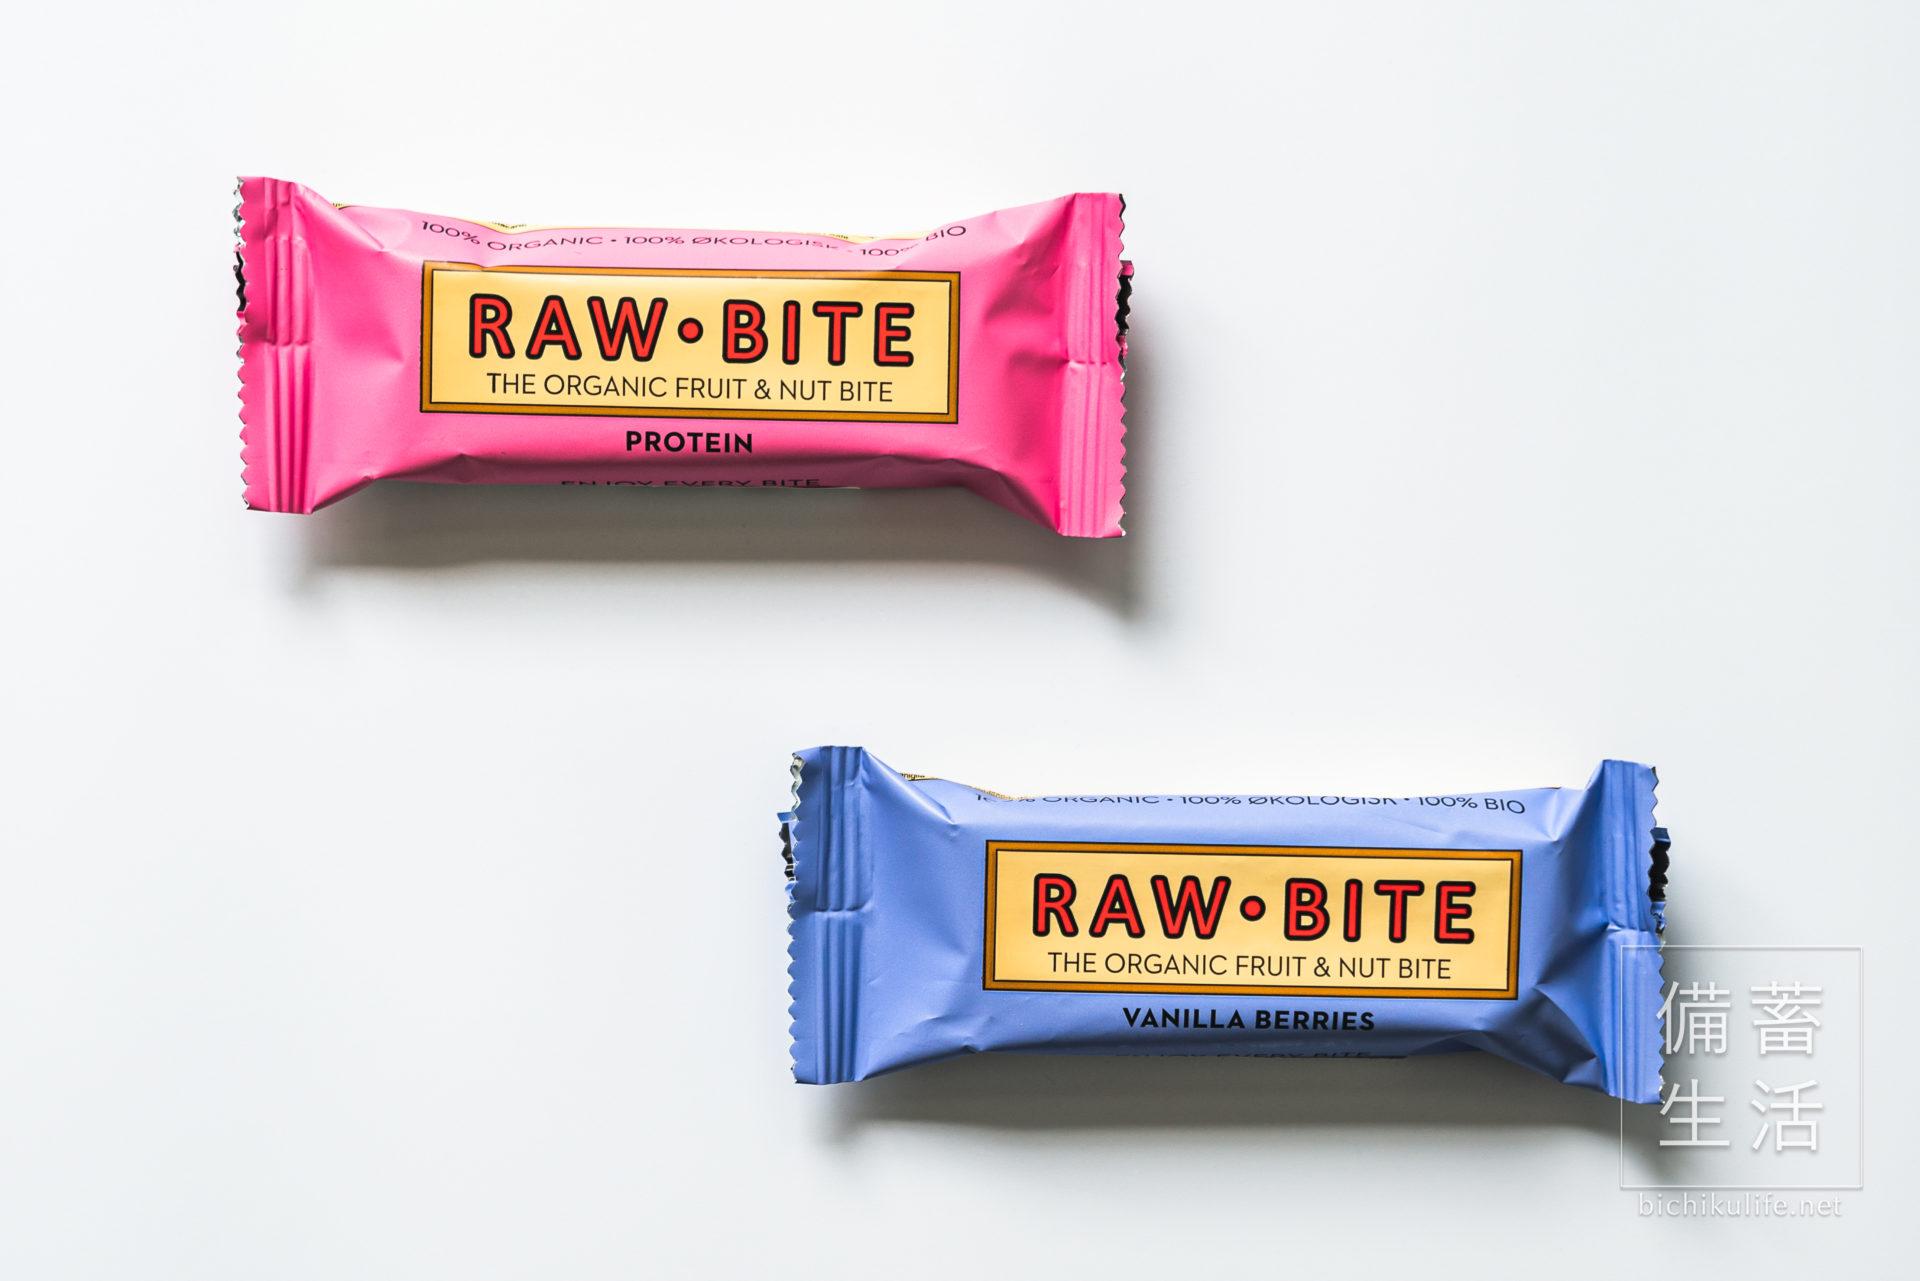 RAW・BITE 有機ローバイト(オーガニックフルーツ・ナッツバー)